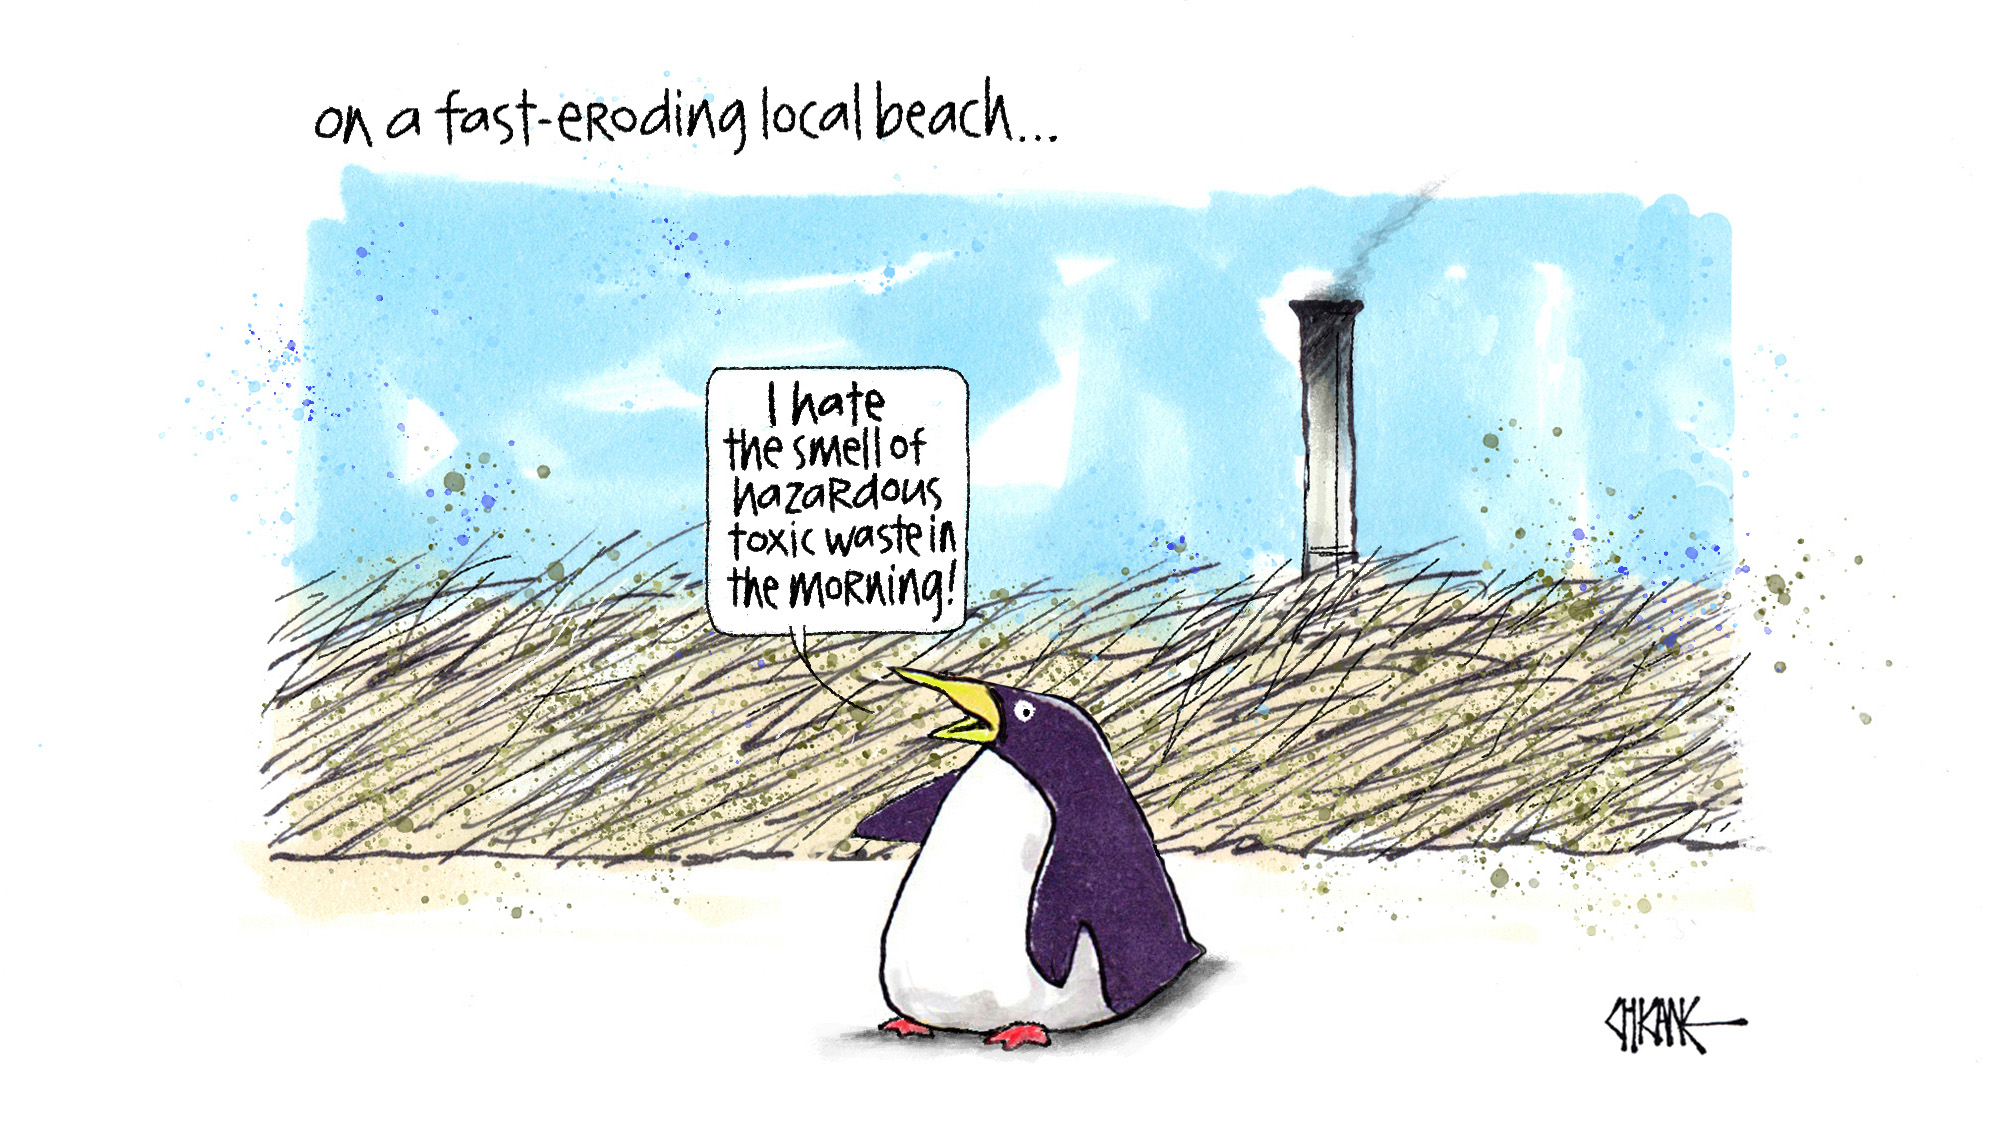 Tiwai Smelter Toxic Waste Chicane Cartoon